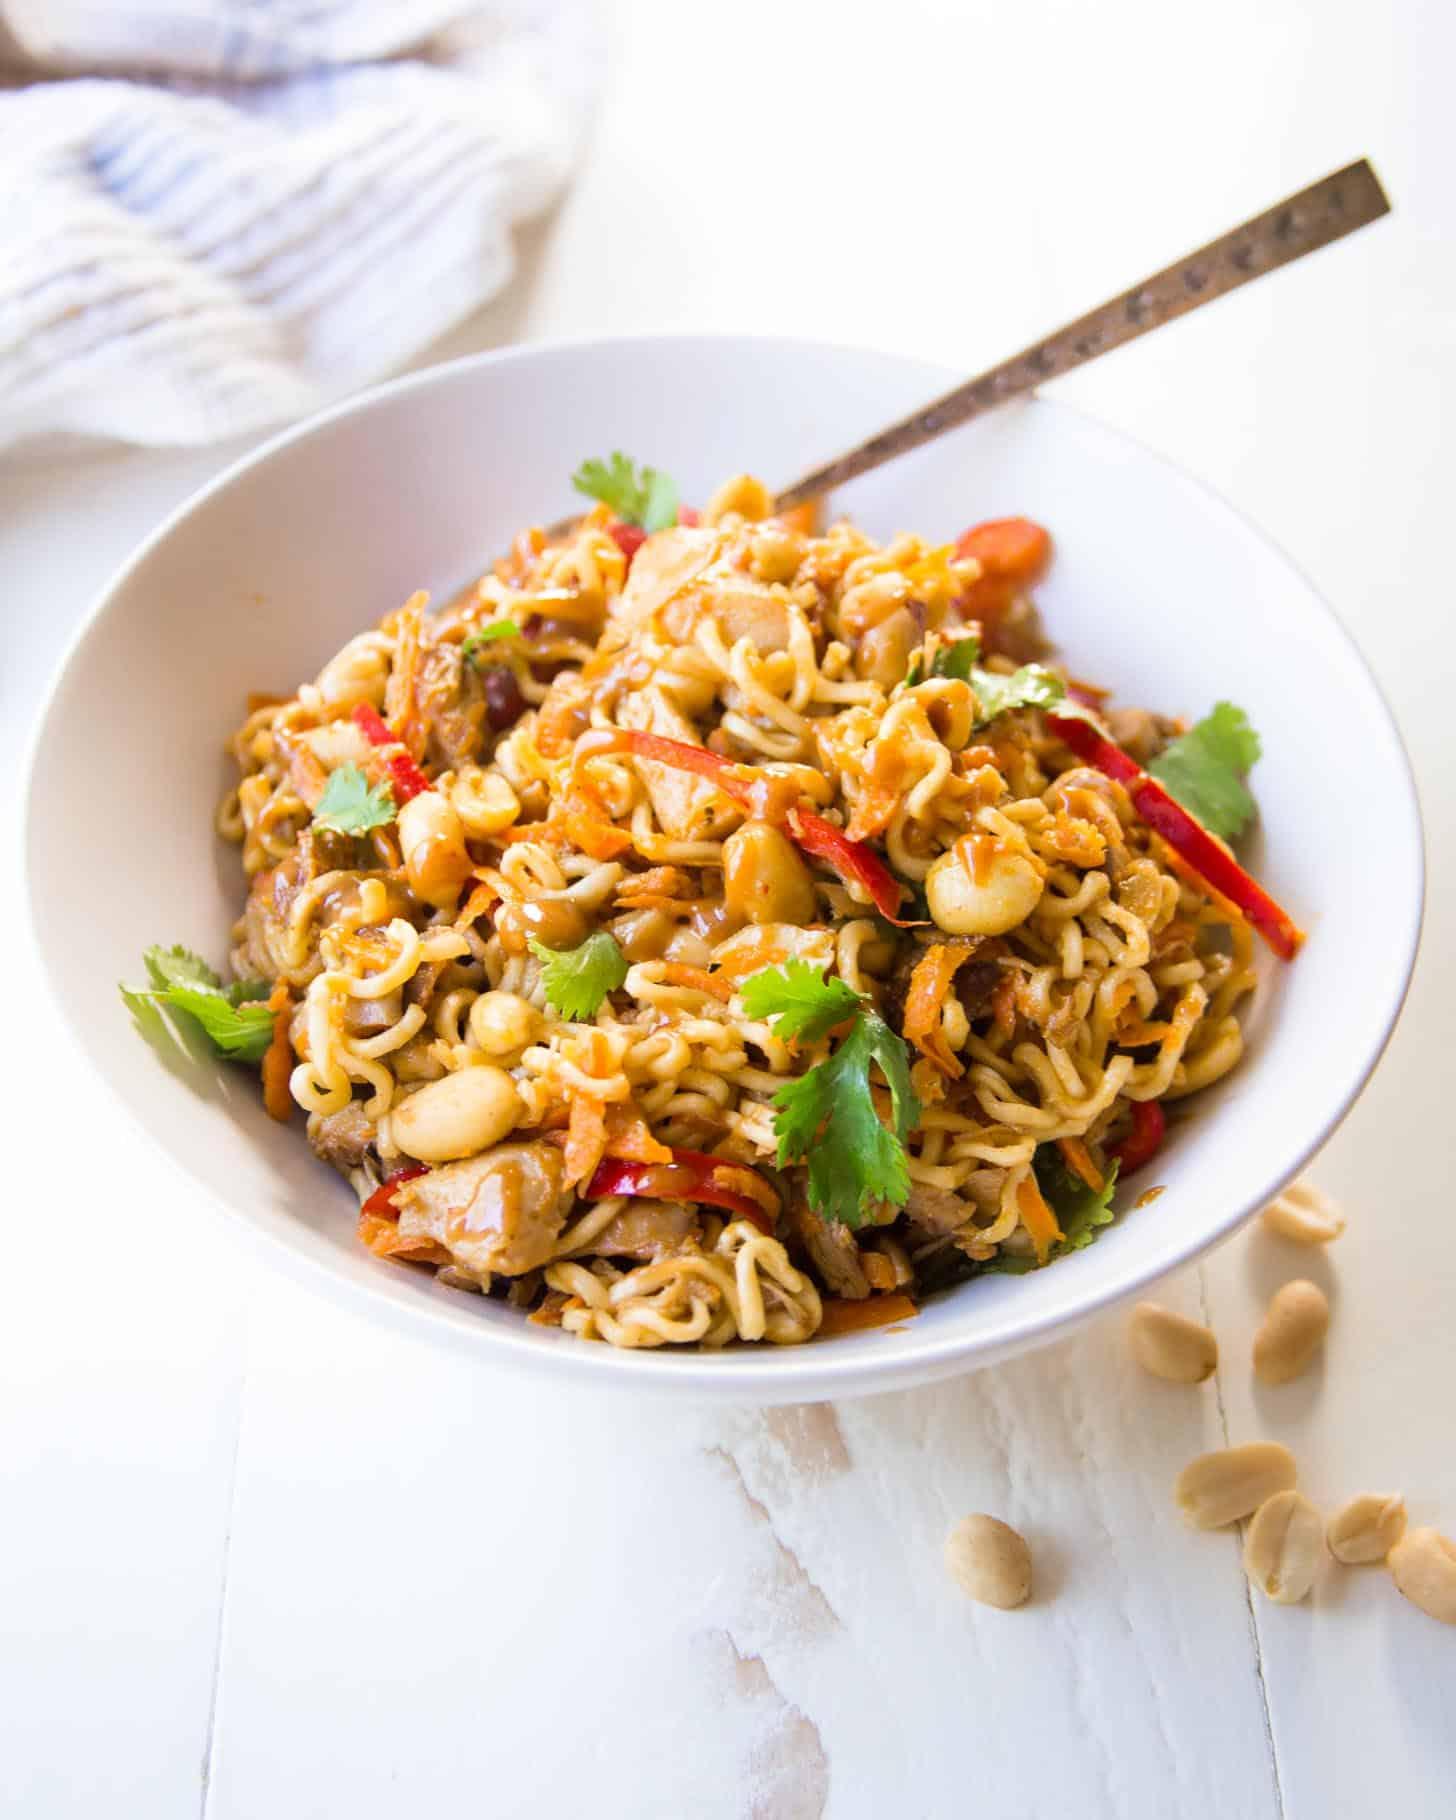 Thai Chicken Peanut Noodles in a bowl